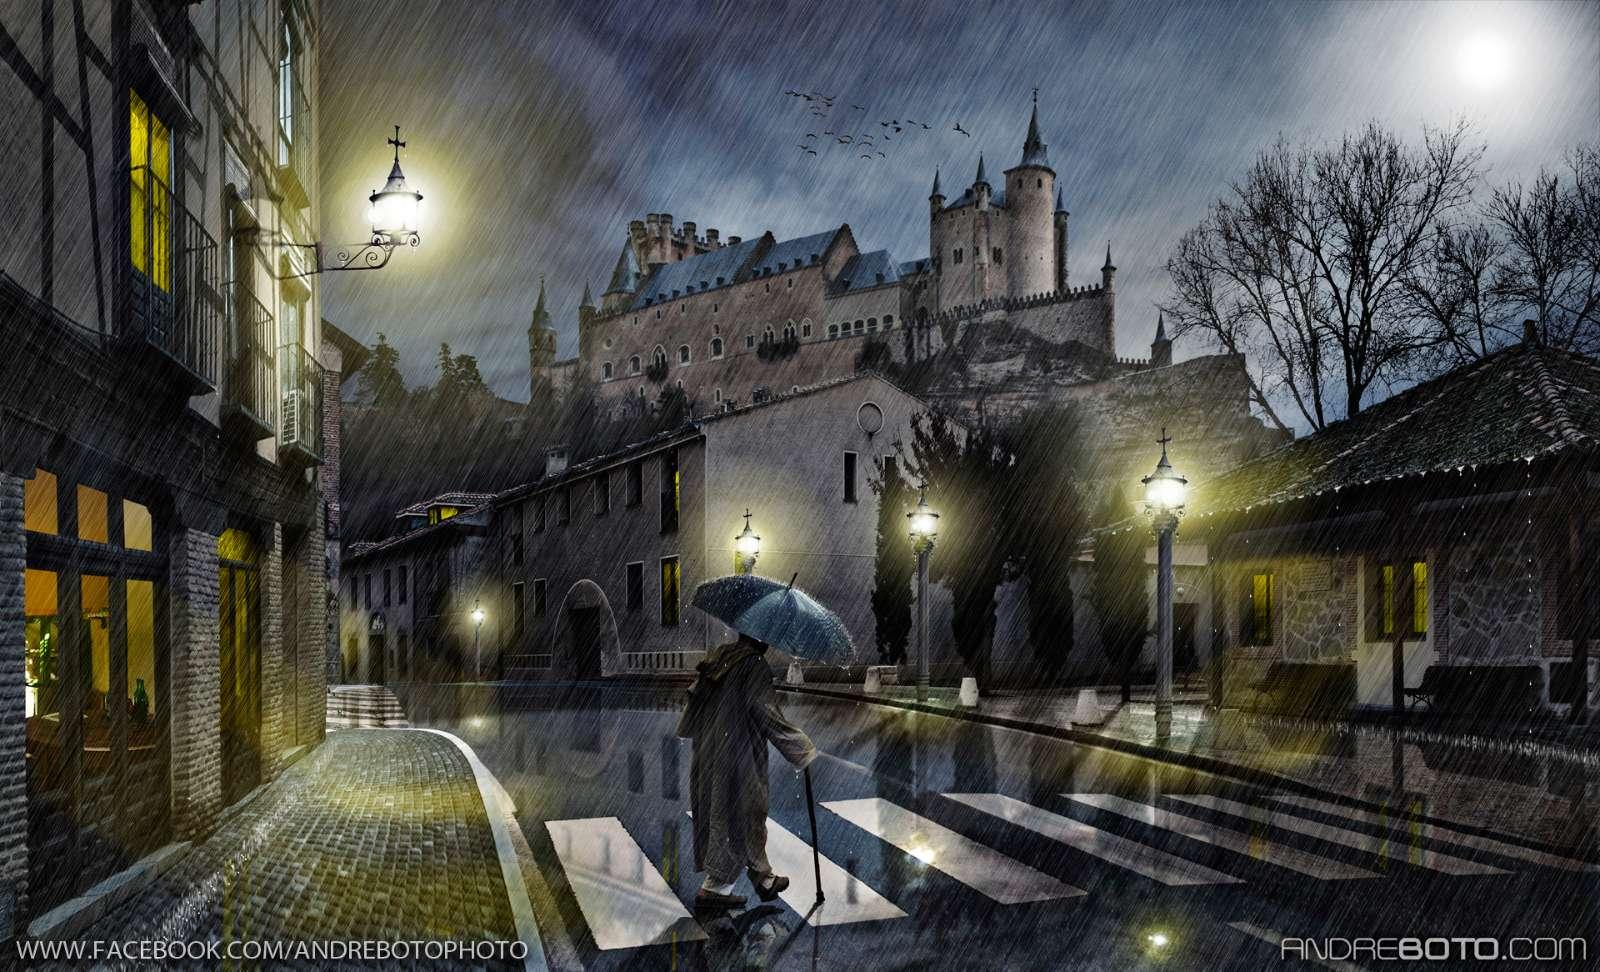 NightWalking de André Boto